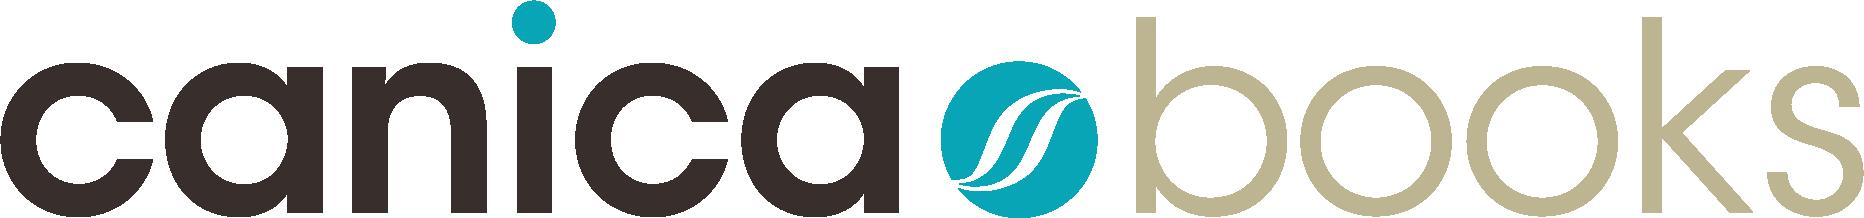 logo-canica1